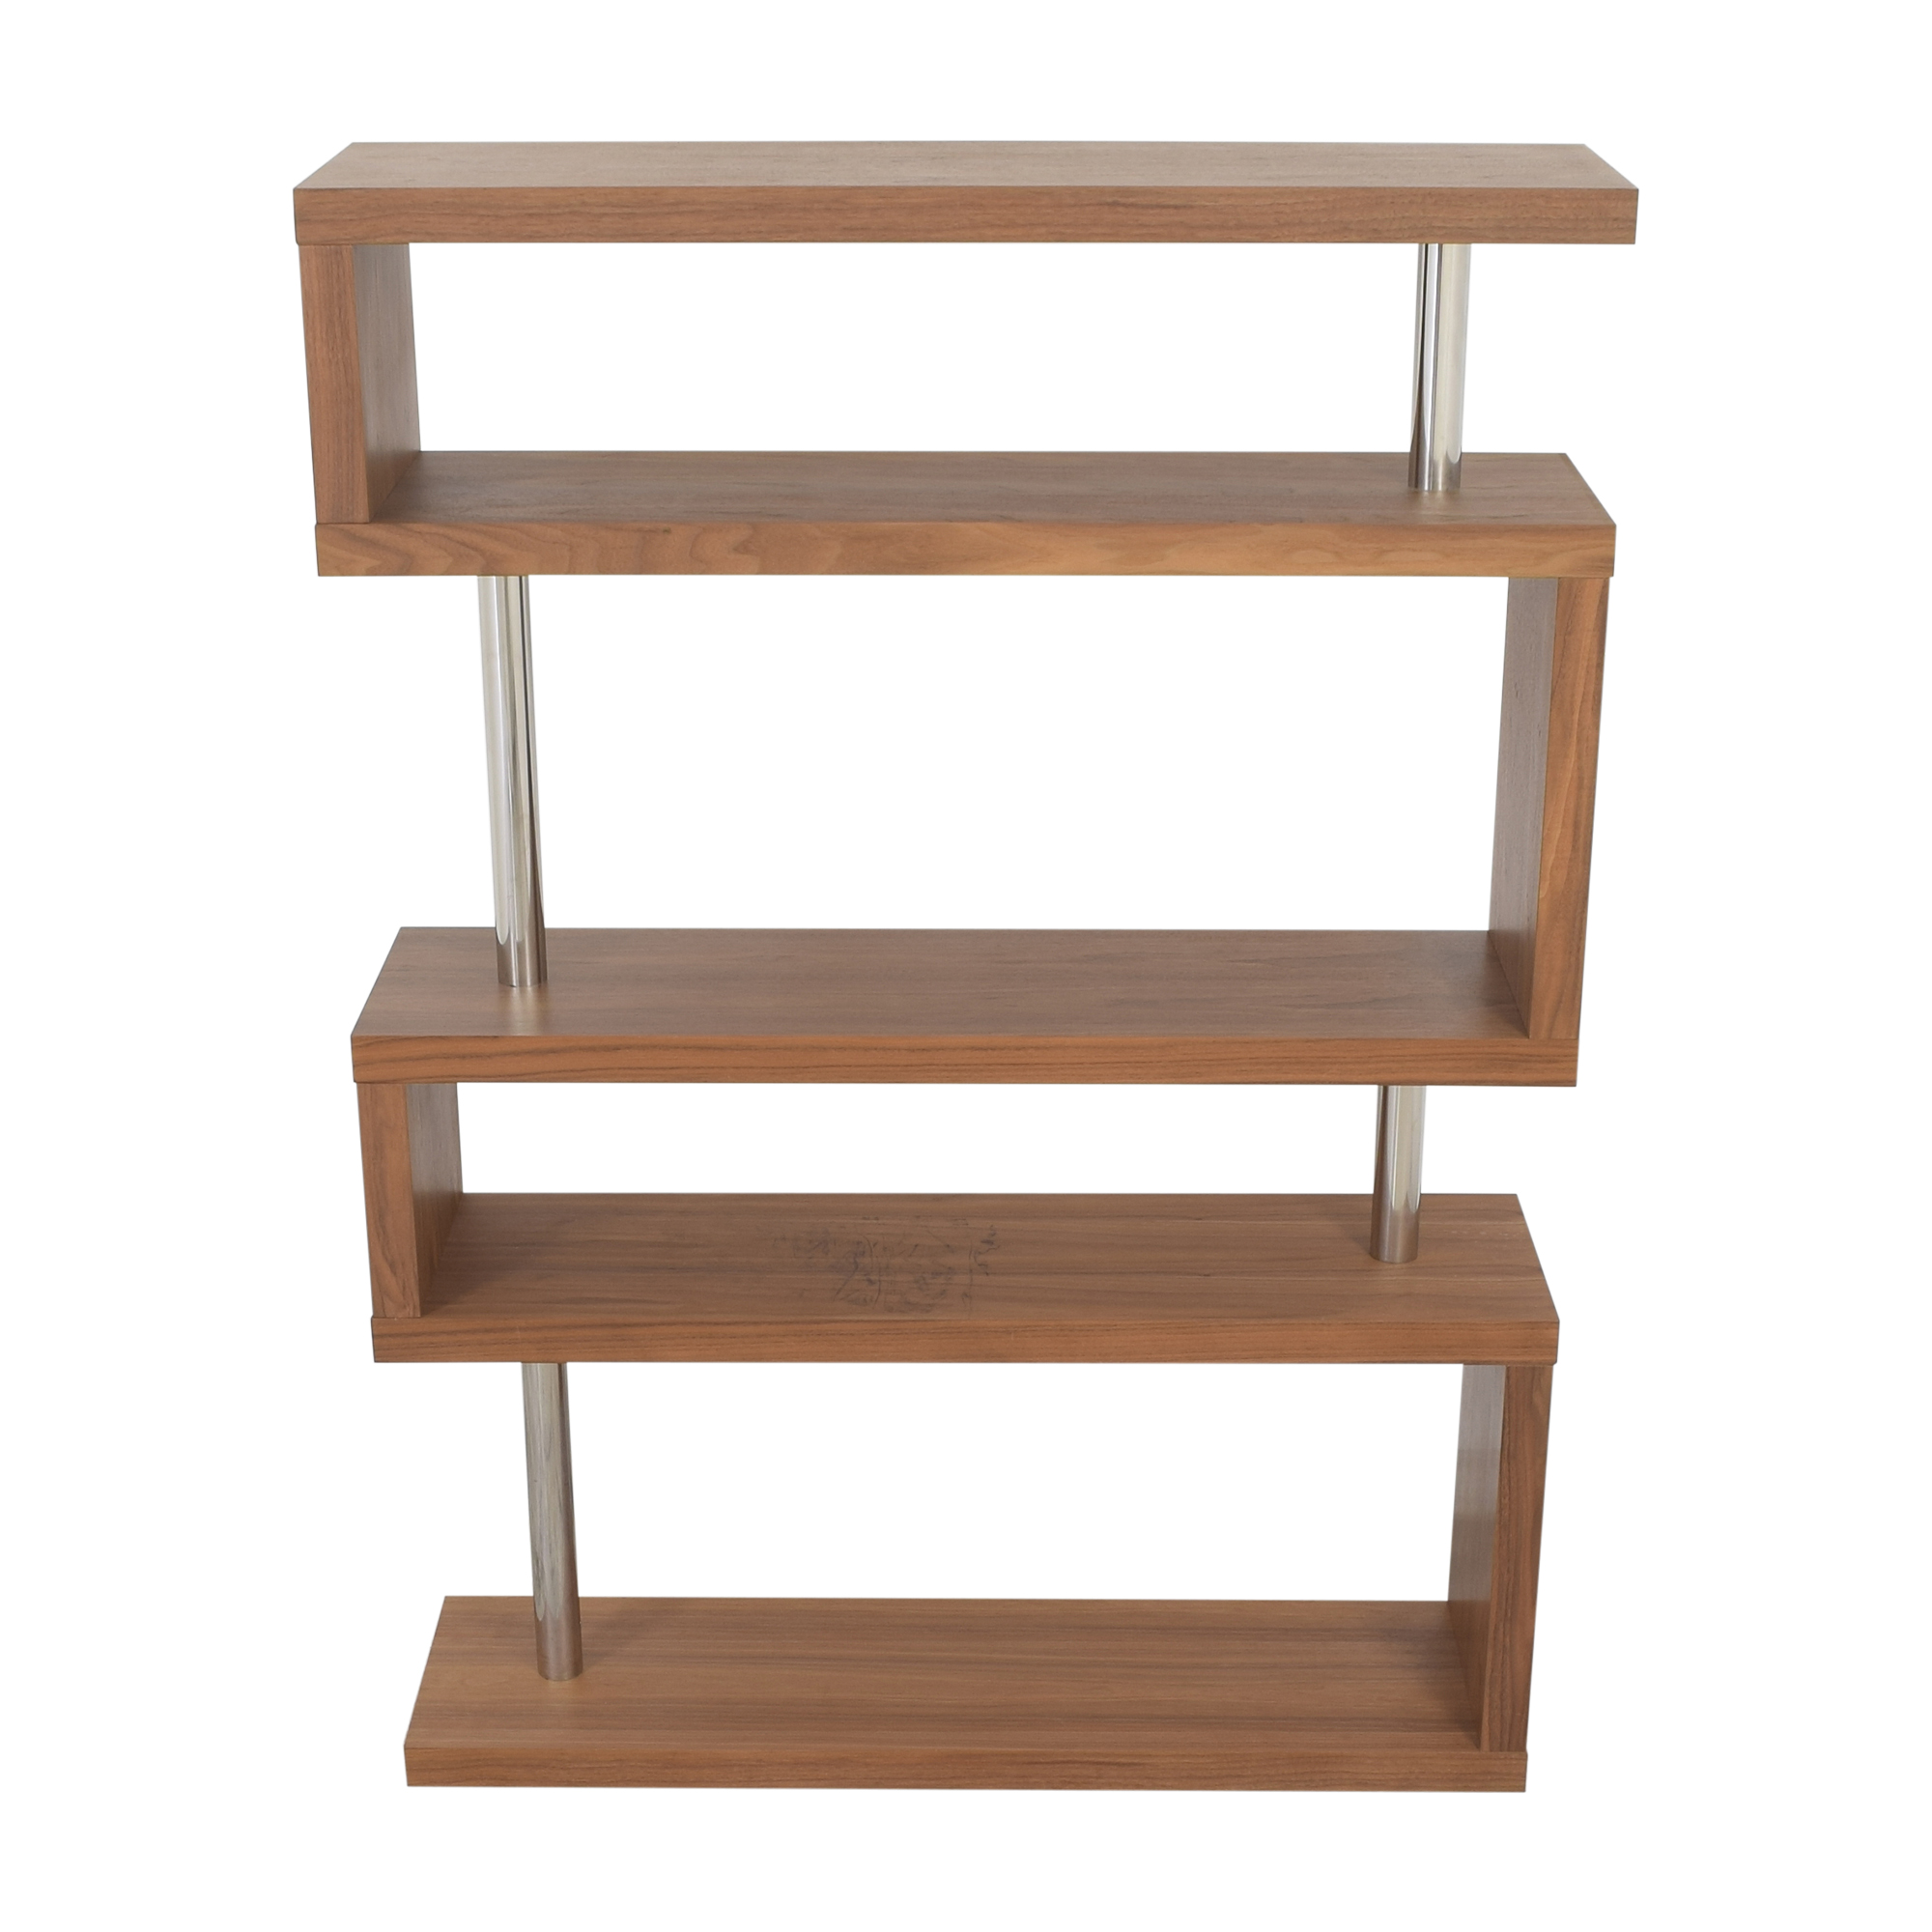 Modani Edan Shelf / Bookcases & Shelving